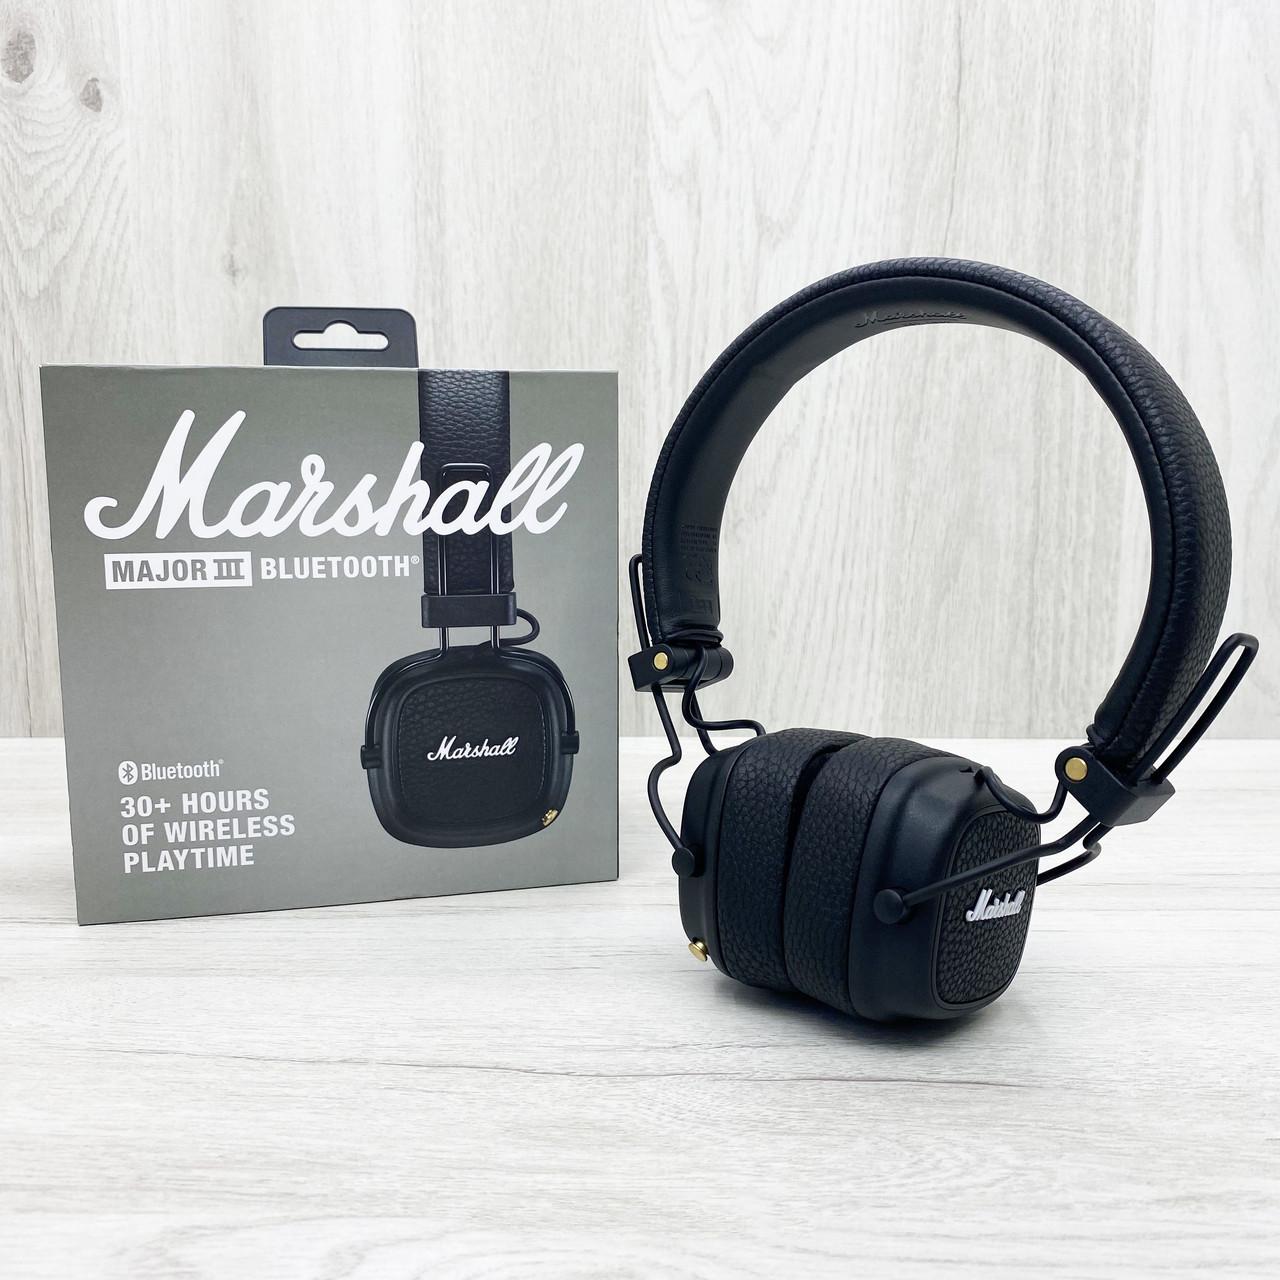 Бездротові навушники Marshall Major III BLUETOOTH (чорні)